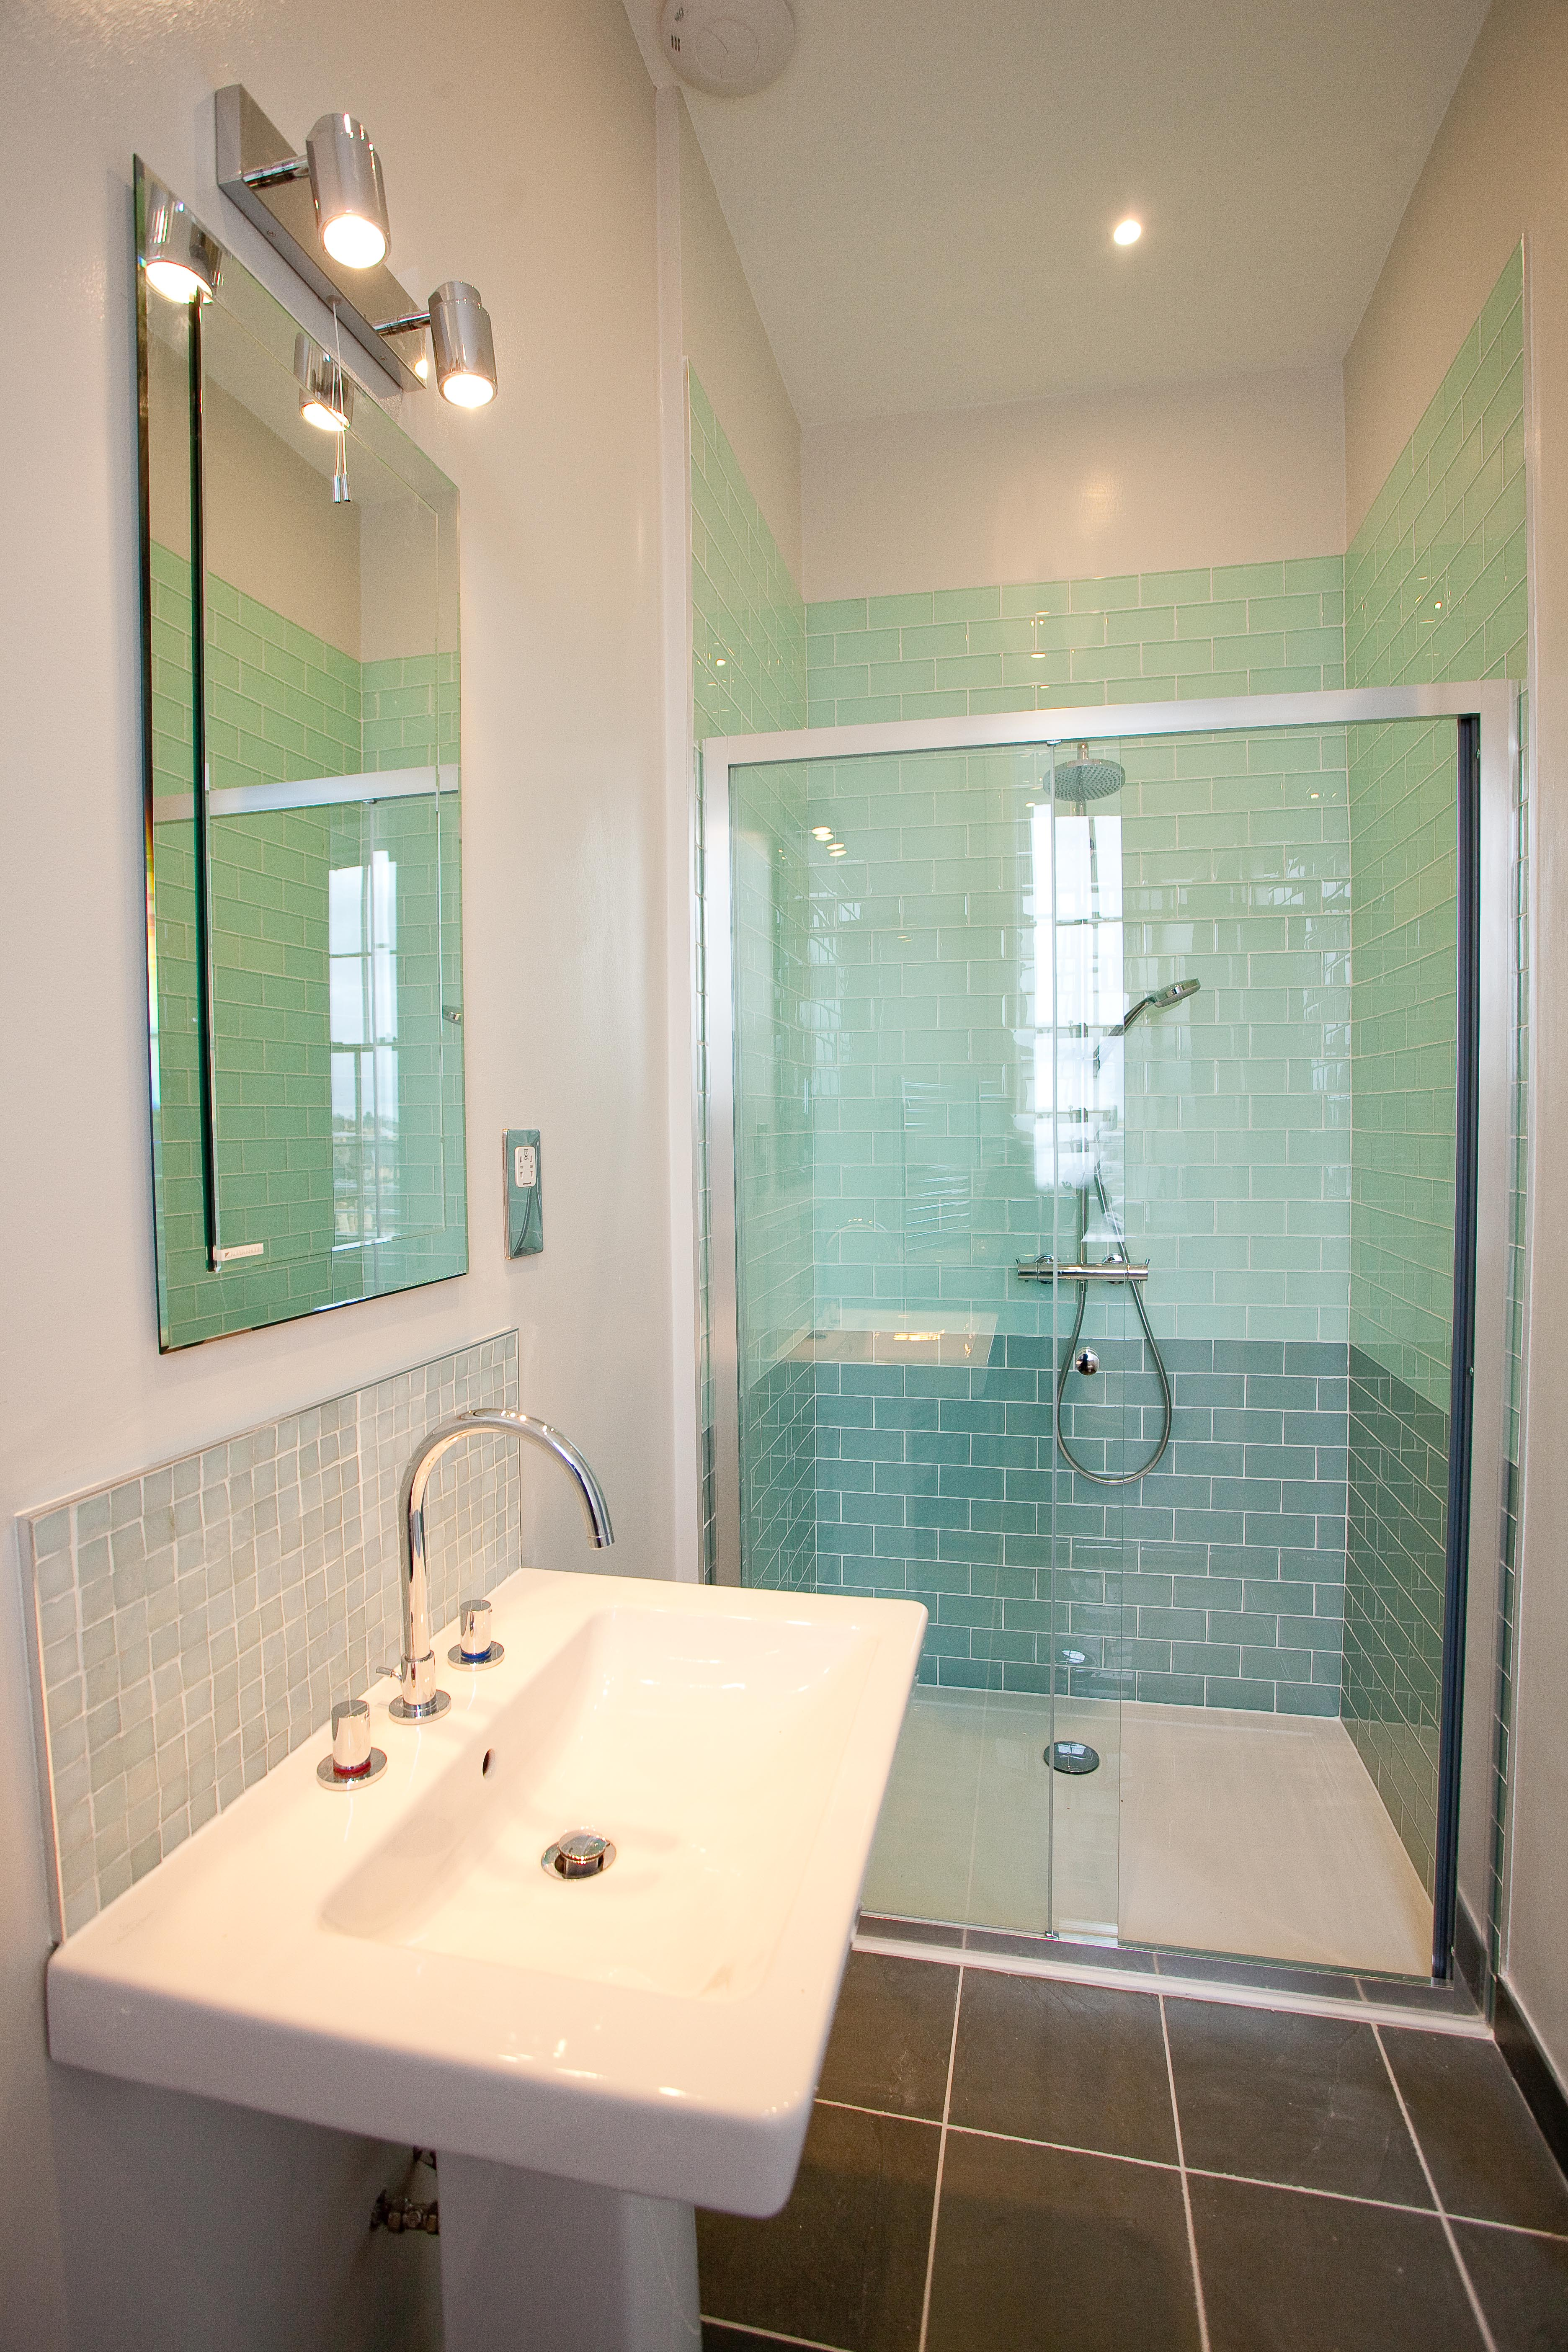 Edinburgh Shower Design with green mosaic tiles and sliding door